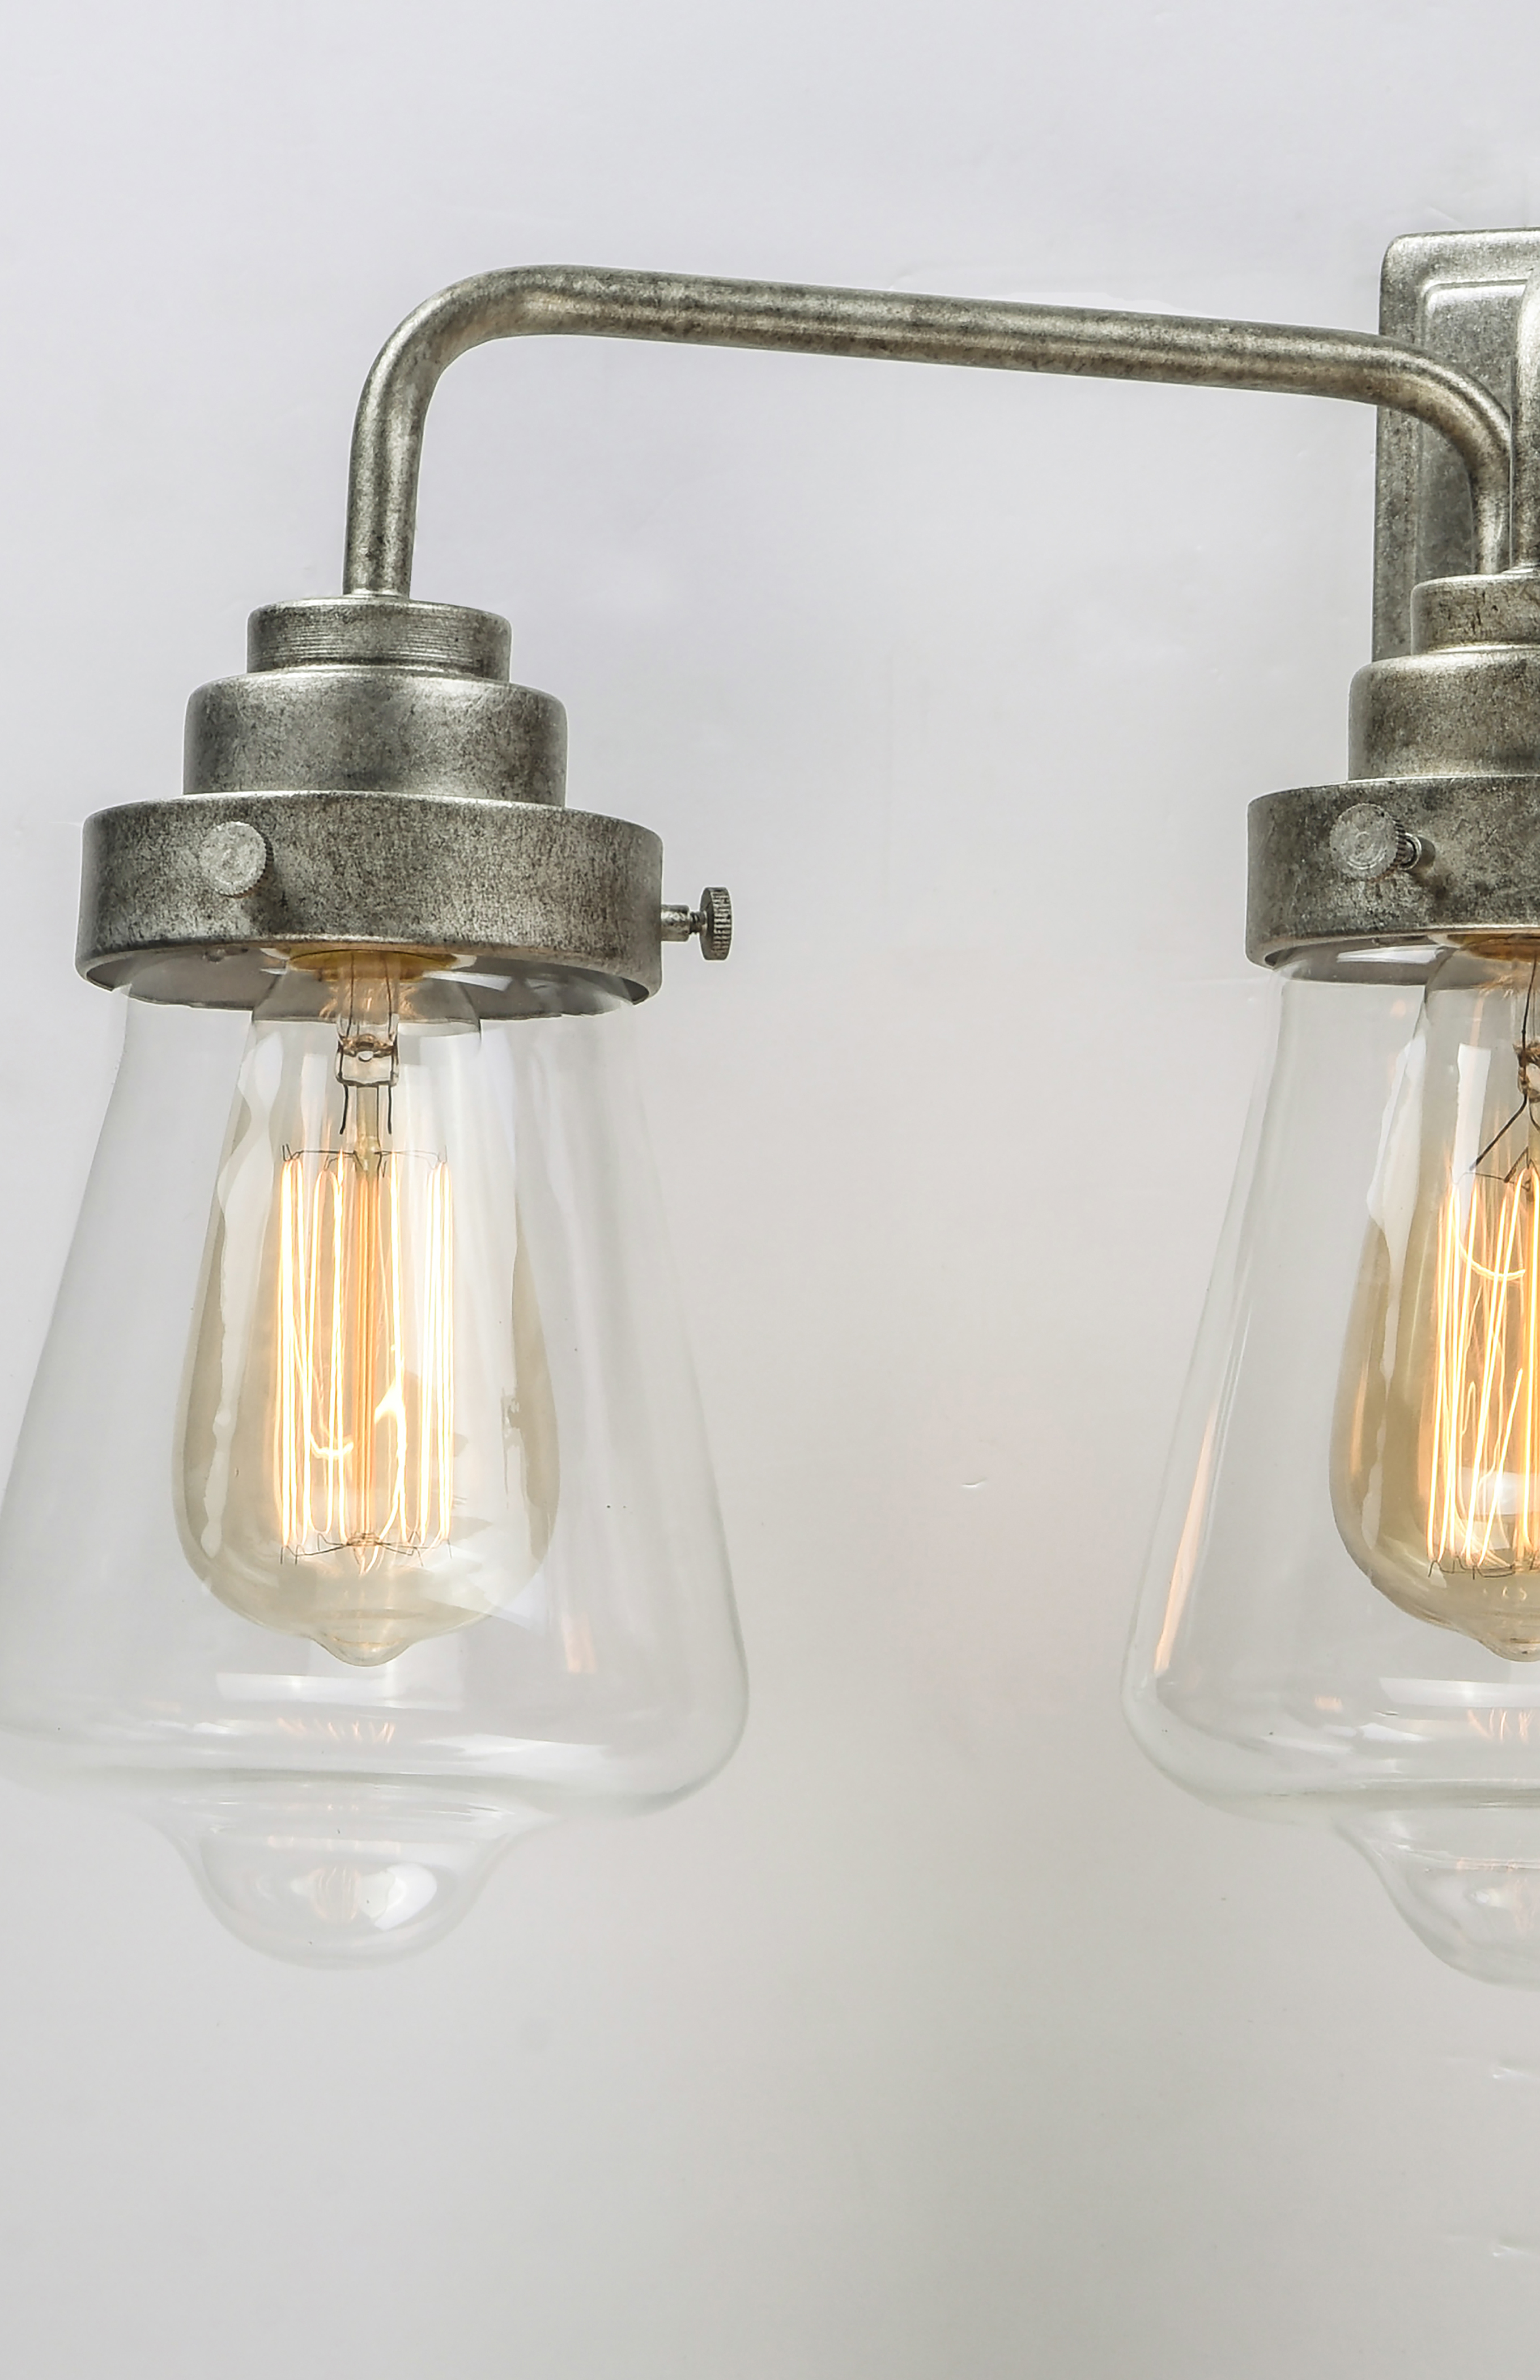 Cape Cod 3 Light Wall Sconce Bath Maxim Lighting